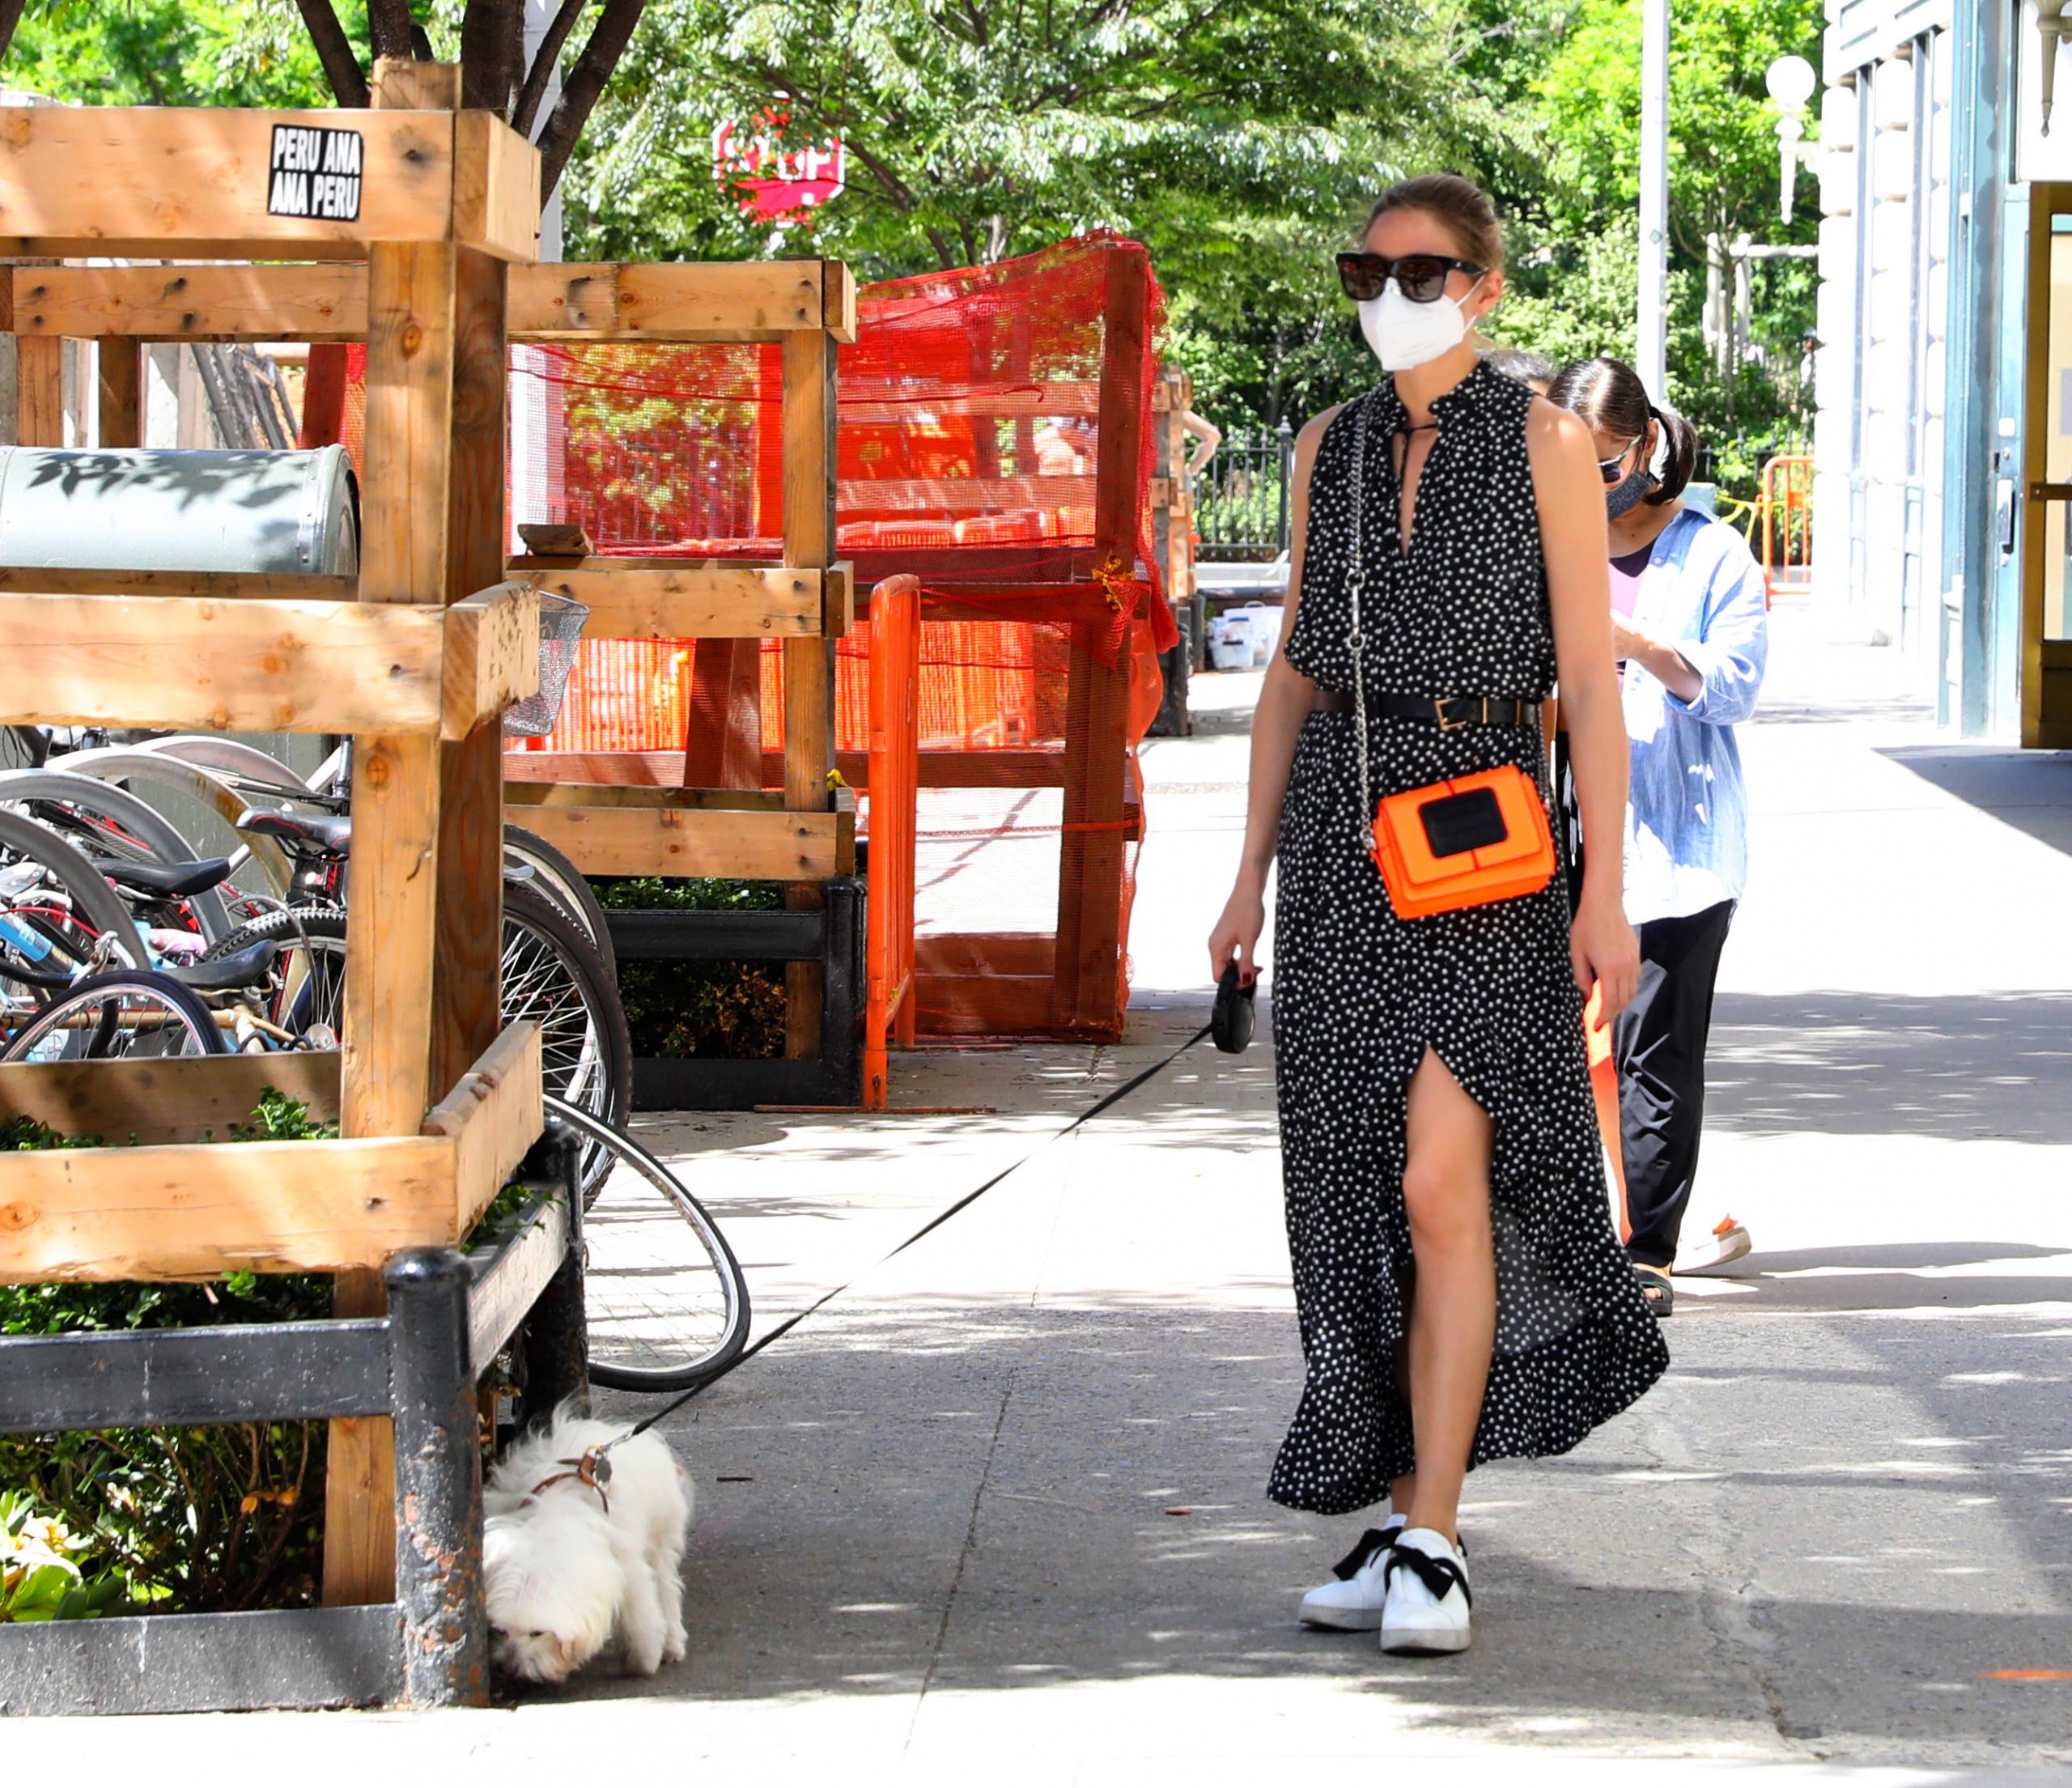 Get the look: Αντιγράψαμε το στυλ της Olivia Palermo μόνο με οικονομικά κομμάτια